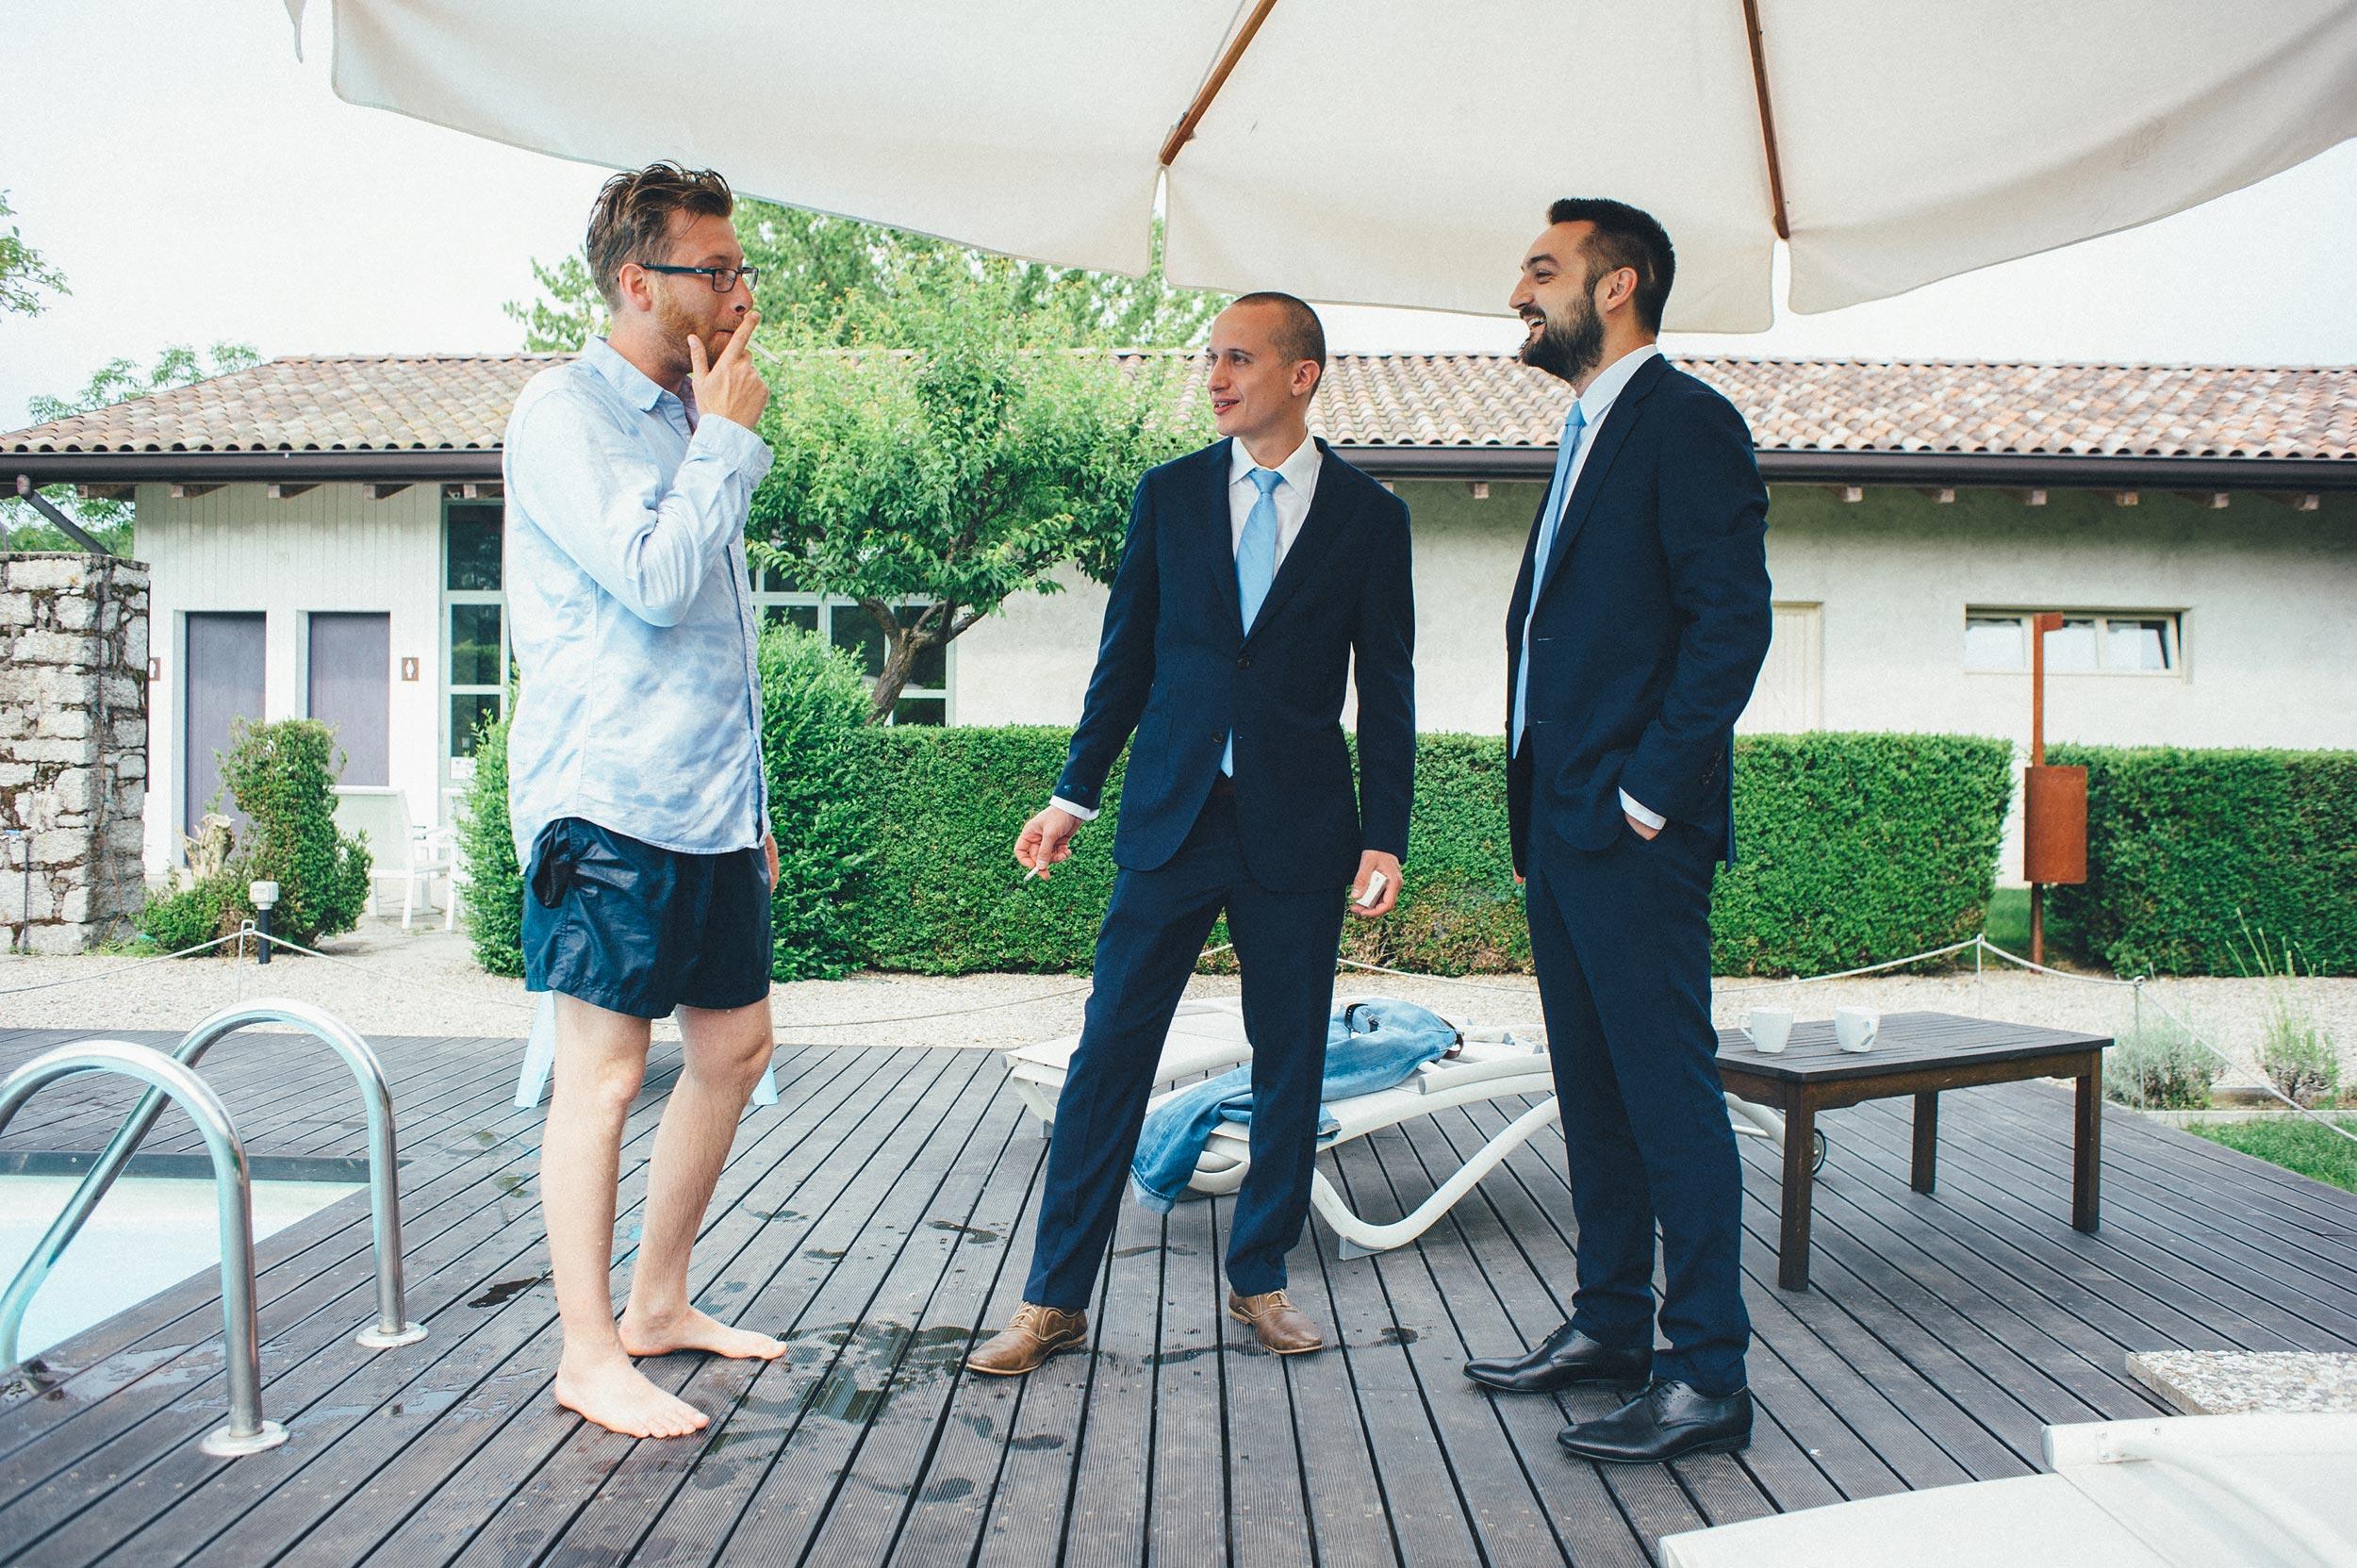 2016-Julius-Silke-Lake-Orta-Wedding-Photographer-Italy-Alessandro-Avenali-7.jpg